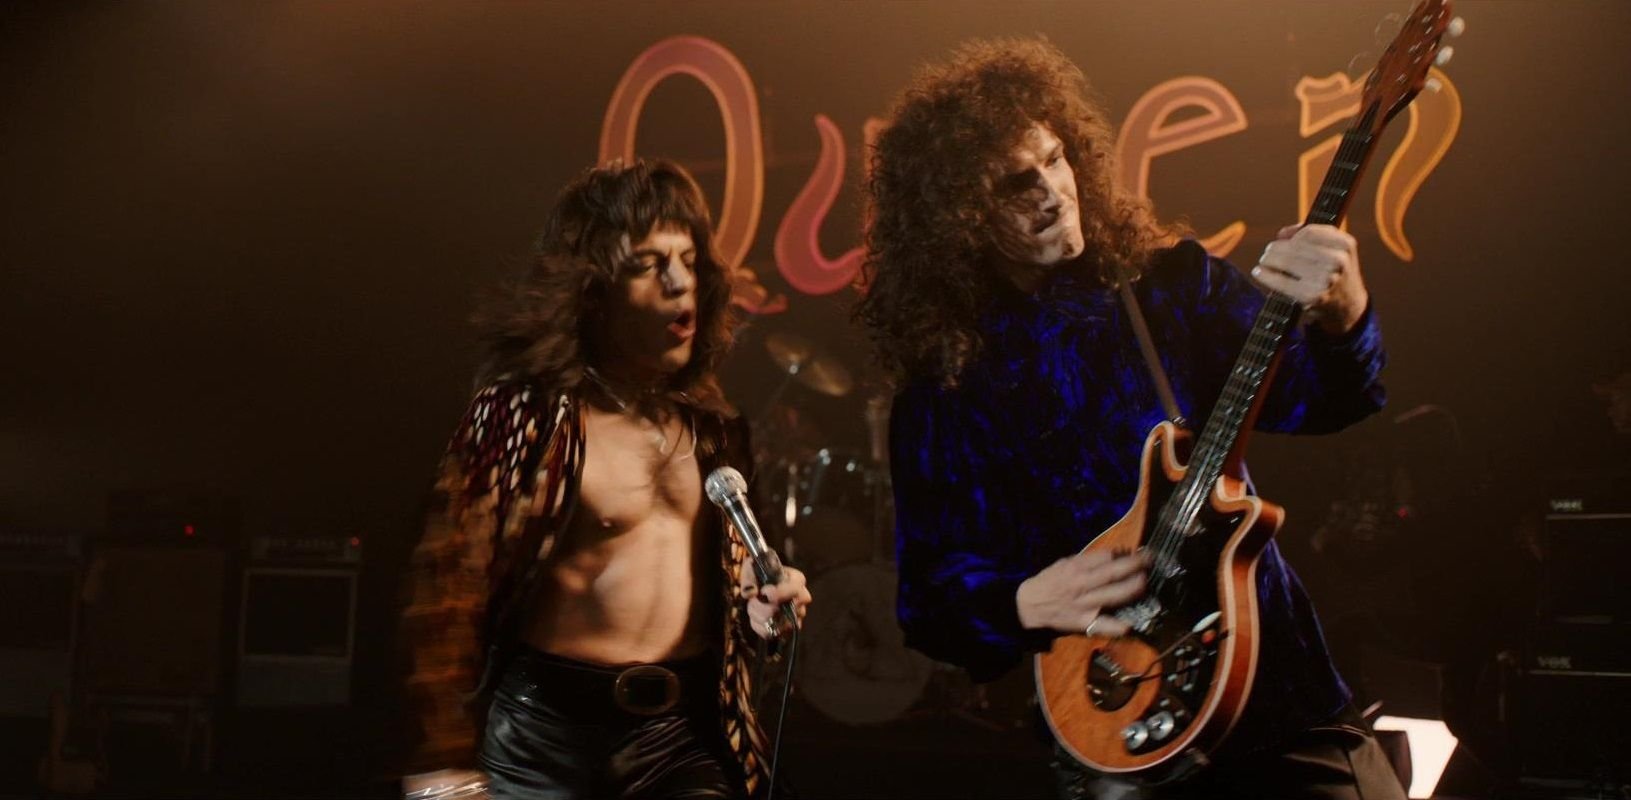 Bohemian Rhapsody Tráiler